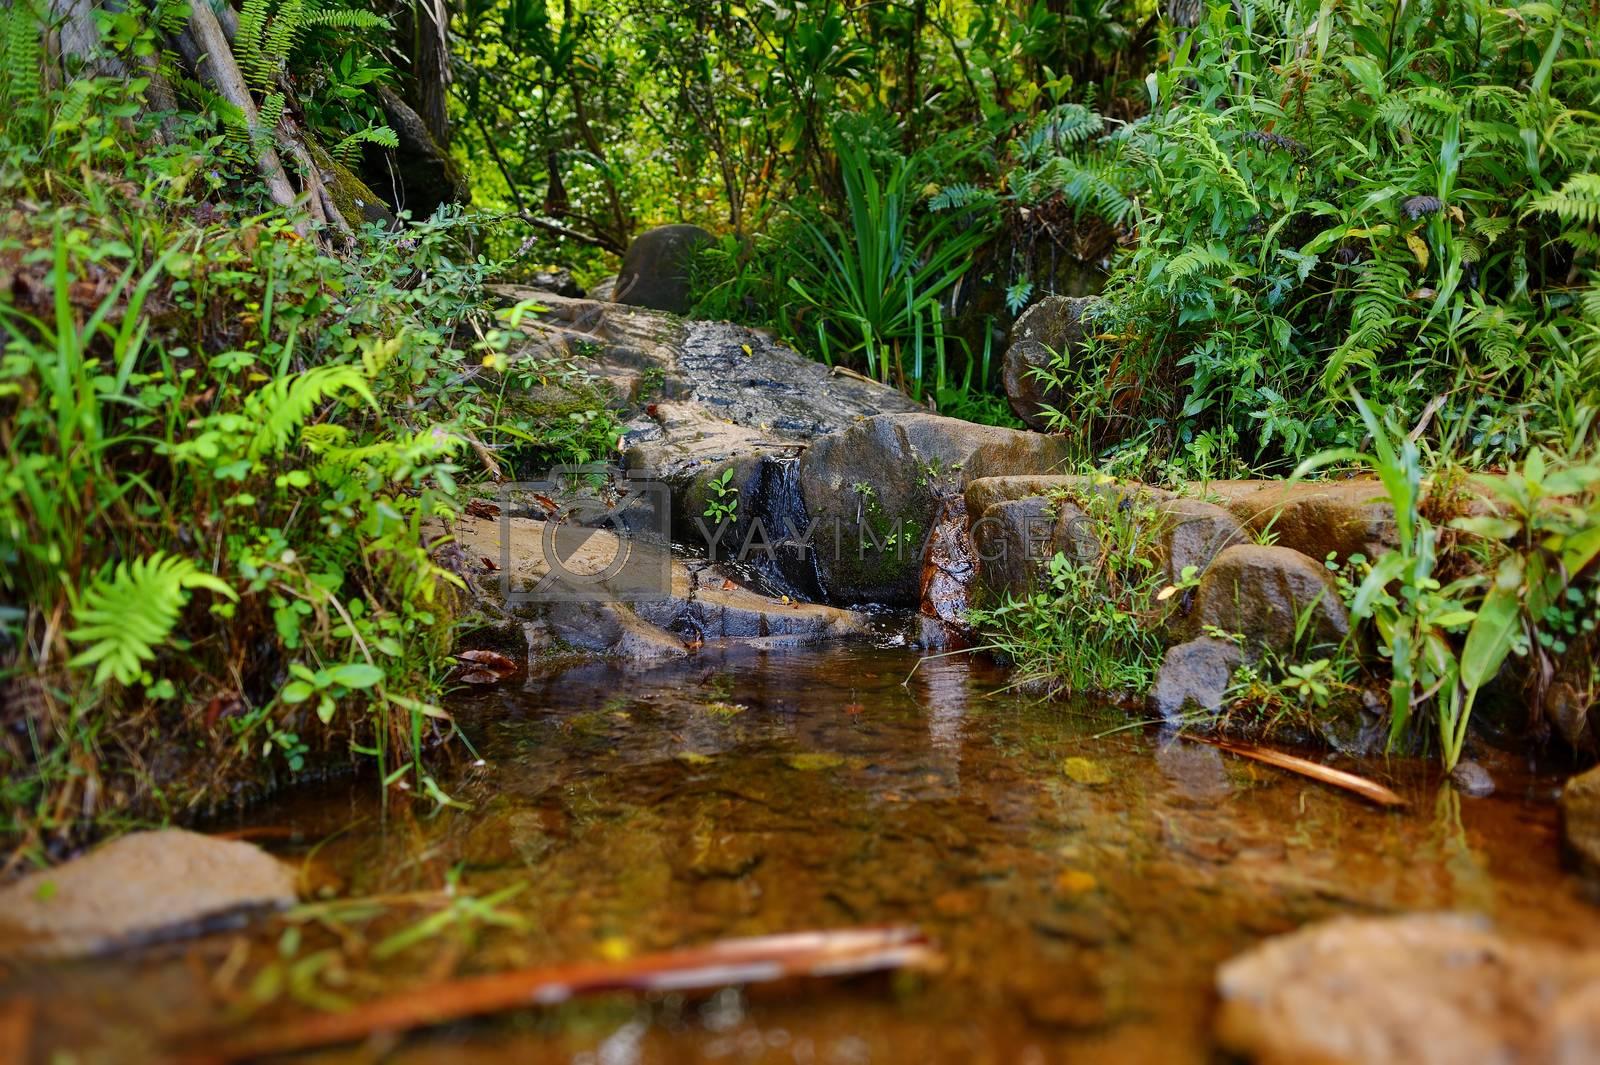 Small tropical river or stream on Kalalau trail, Kauai, Hawaii